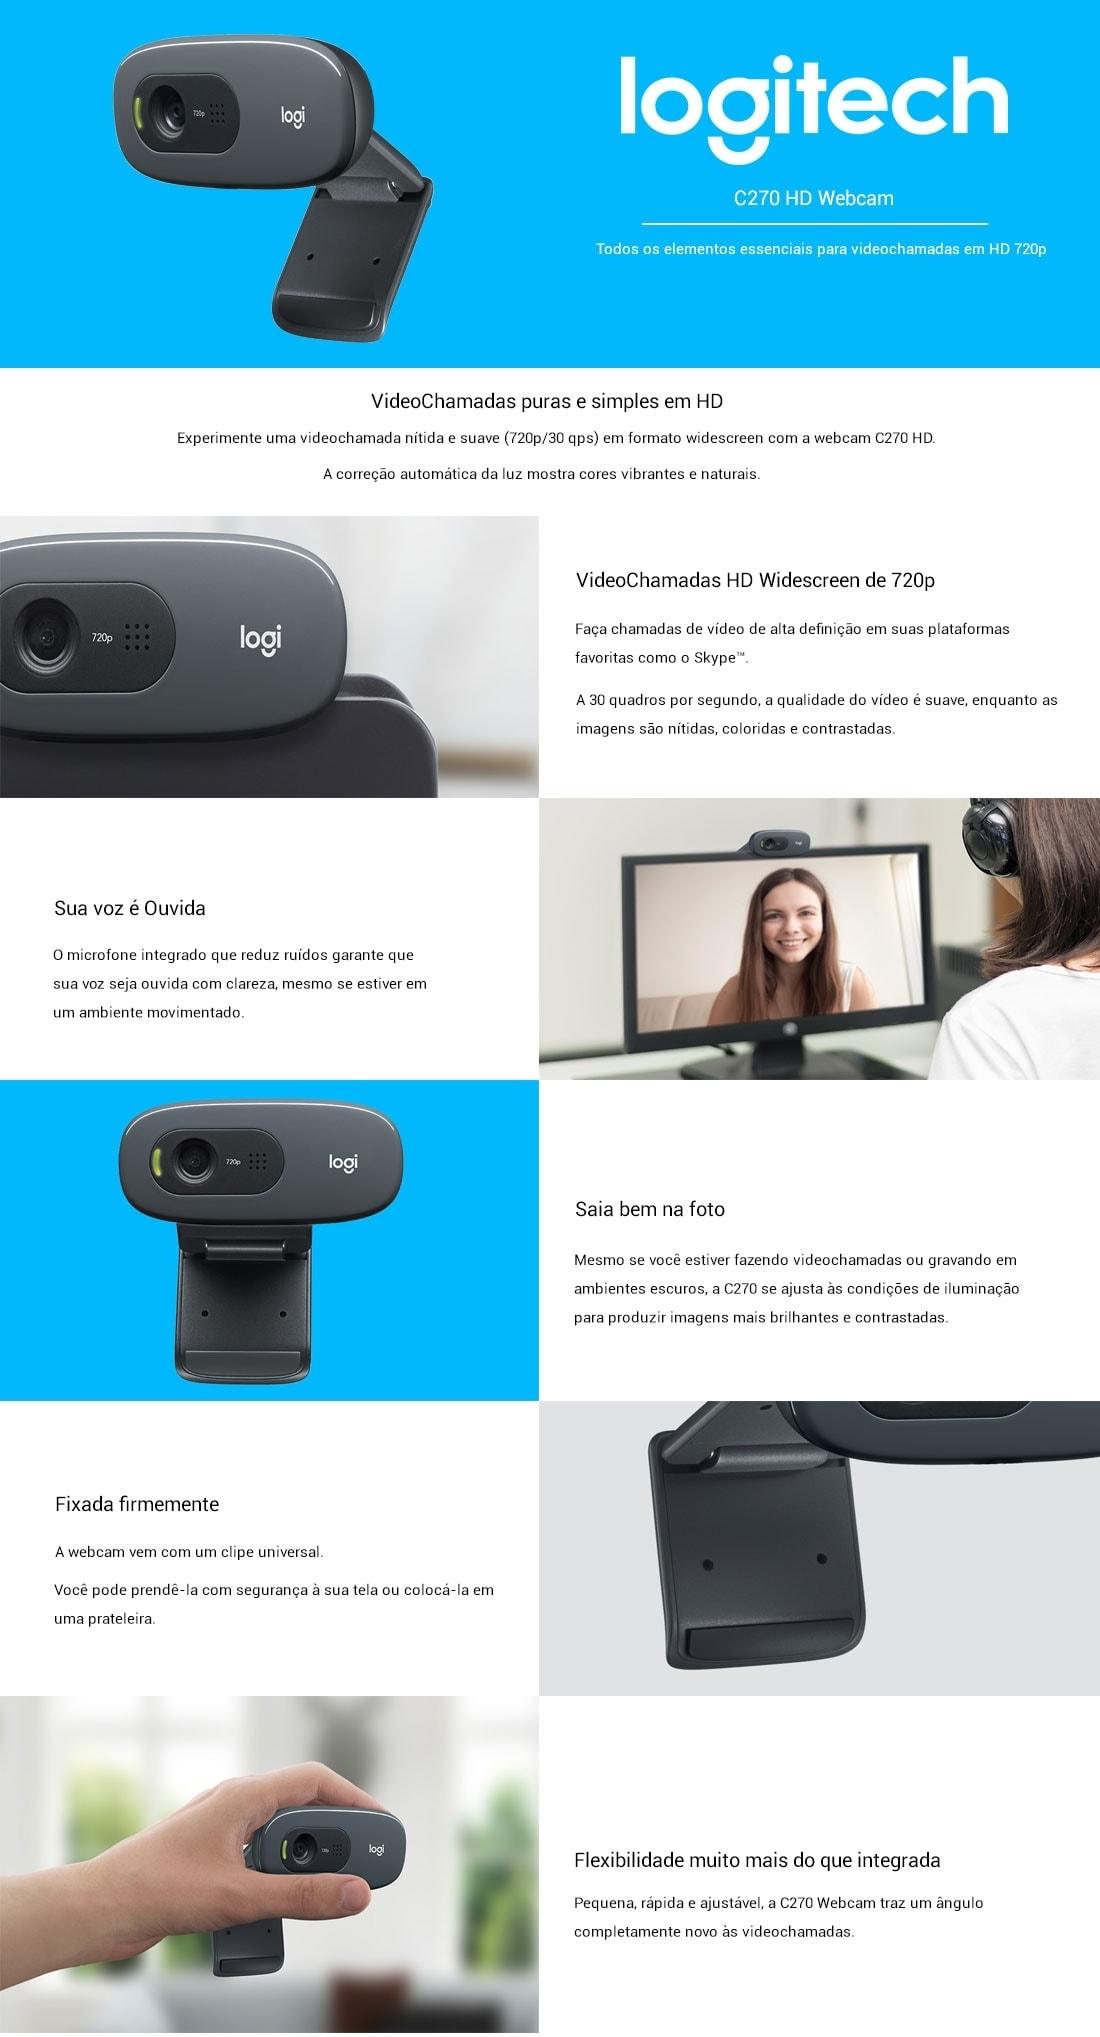 Webcam Logitech Hd C270 Video 720p 3 Megapixels Dhcp Informaes